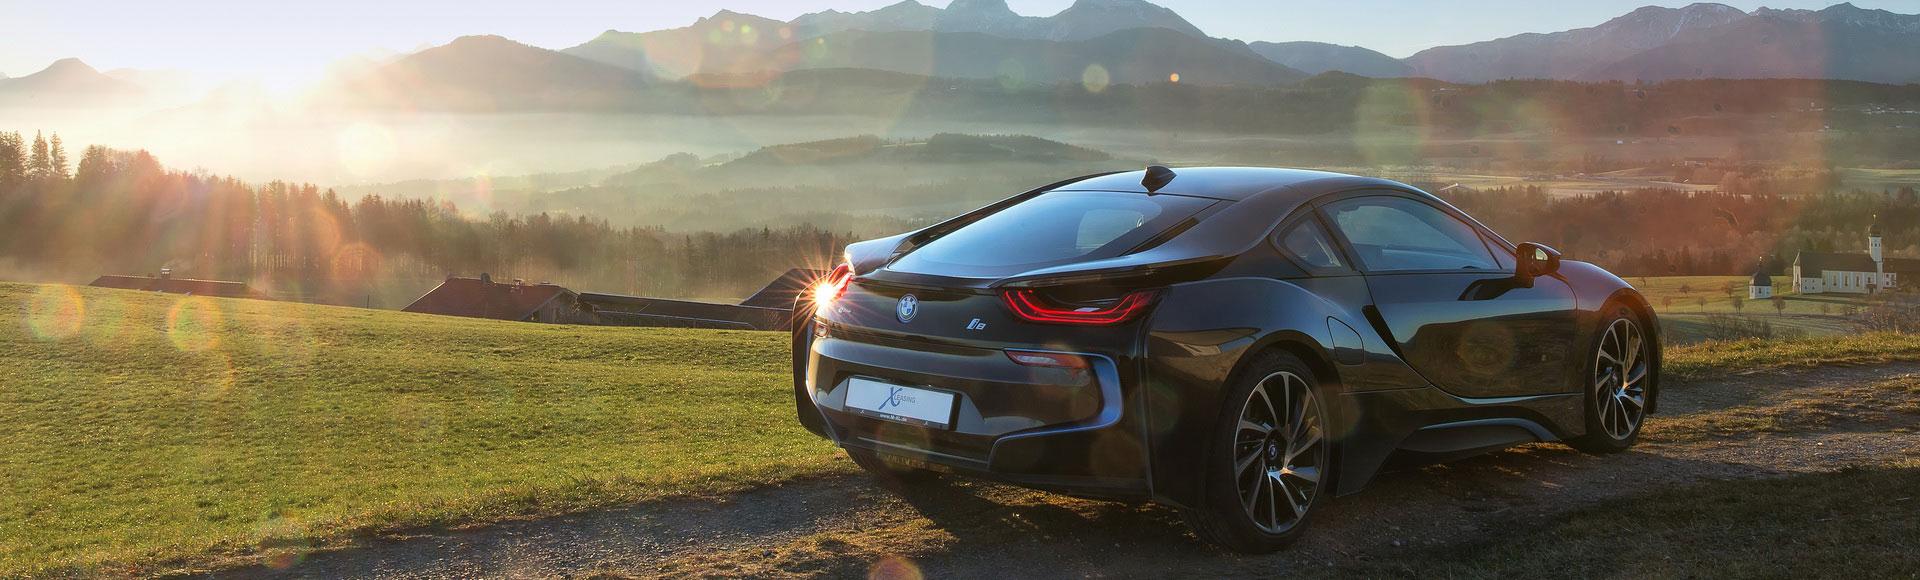 BMW i8 2015 Herbst 1303